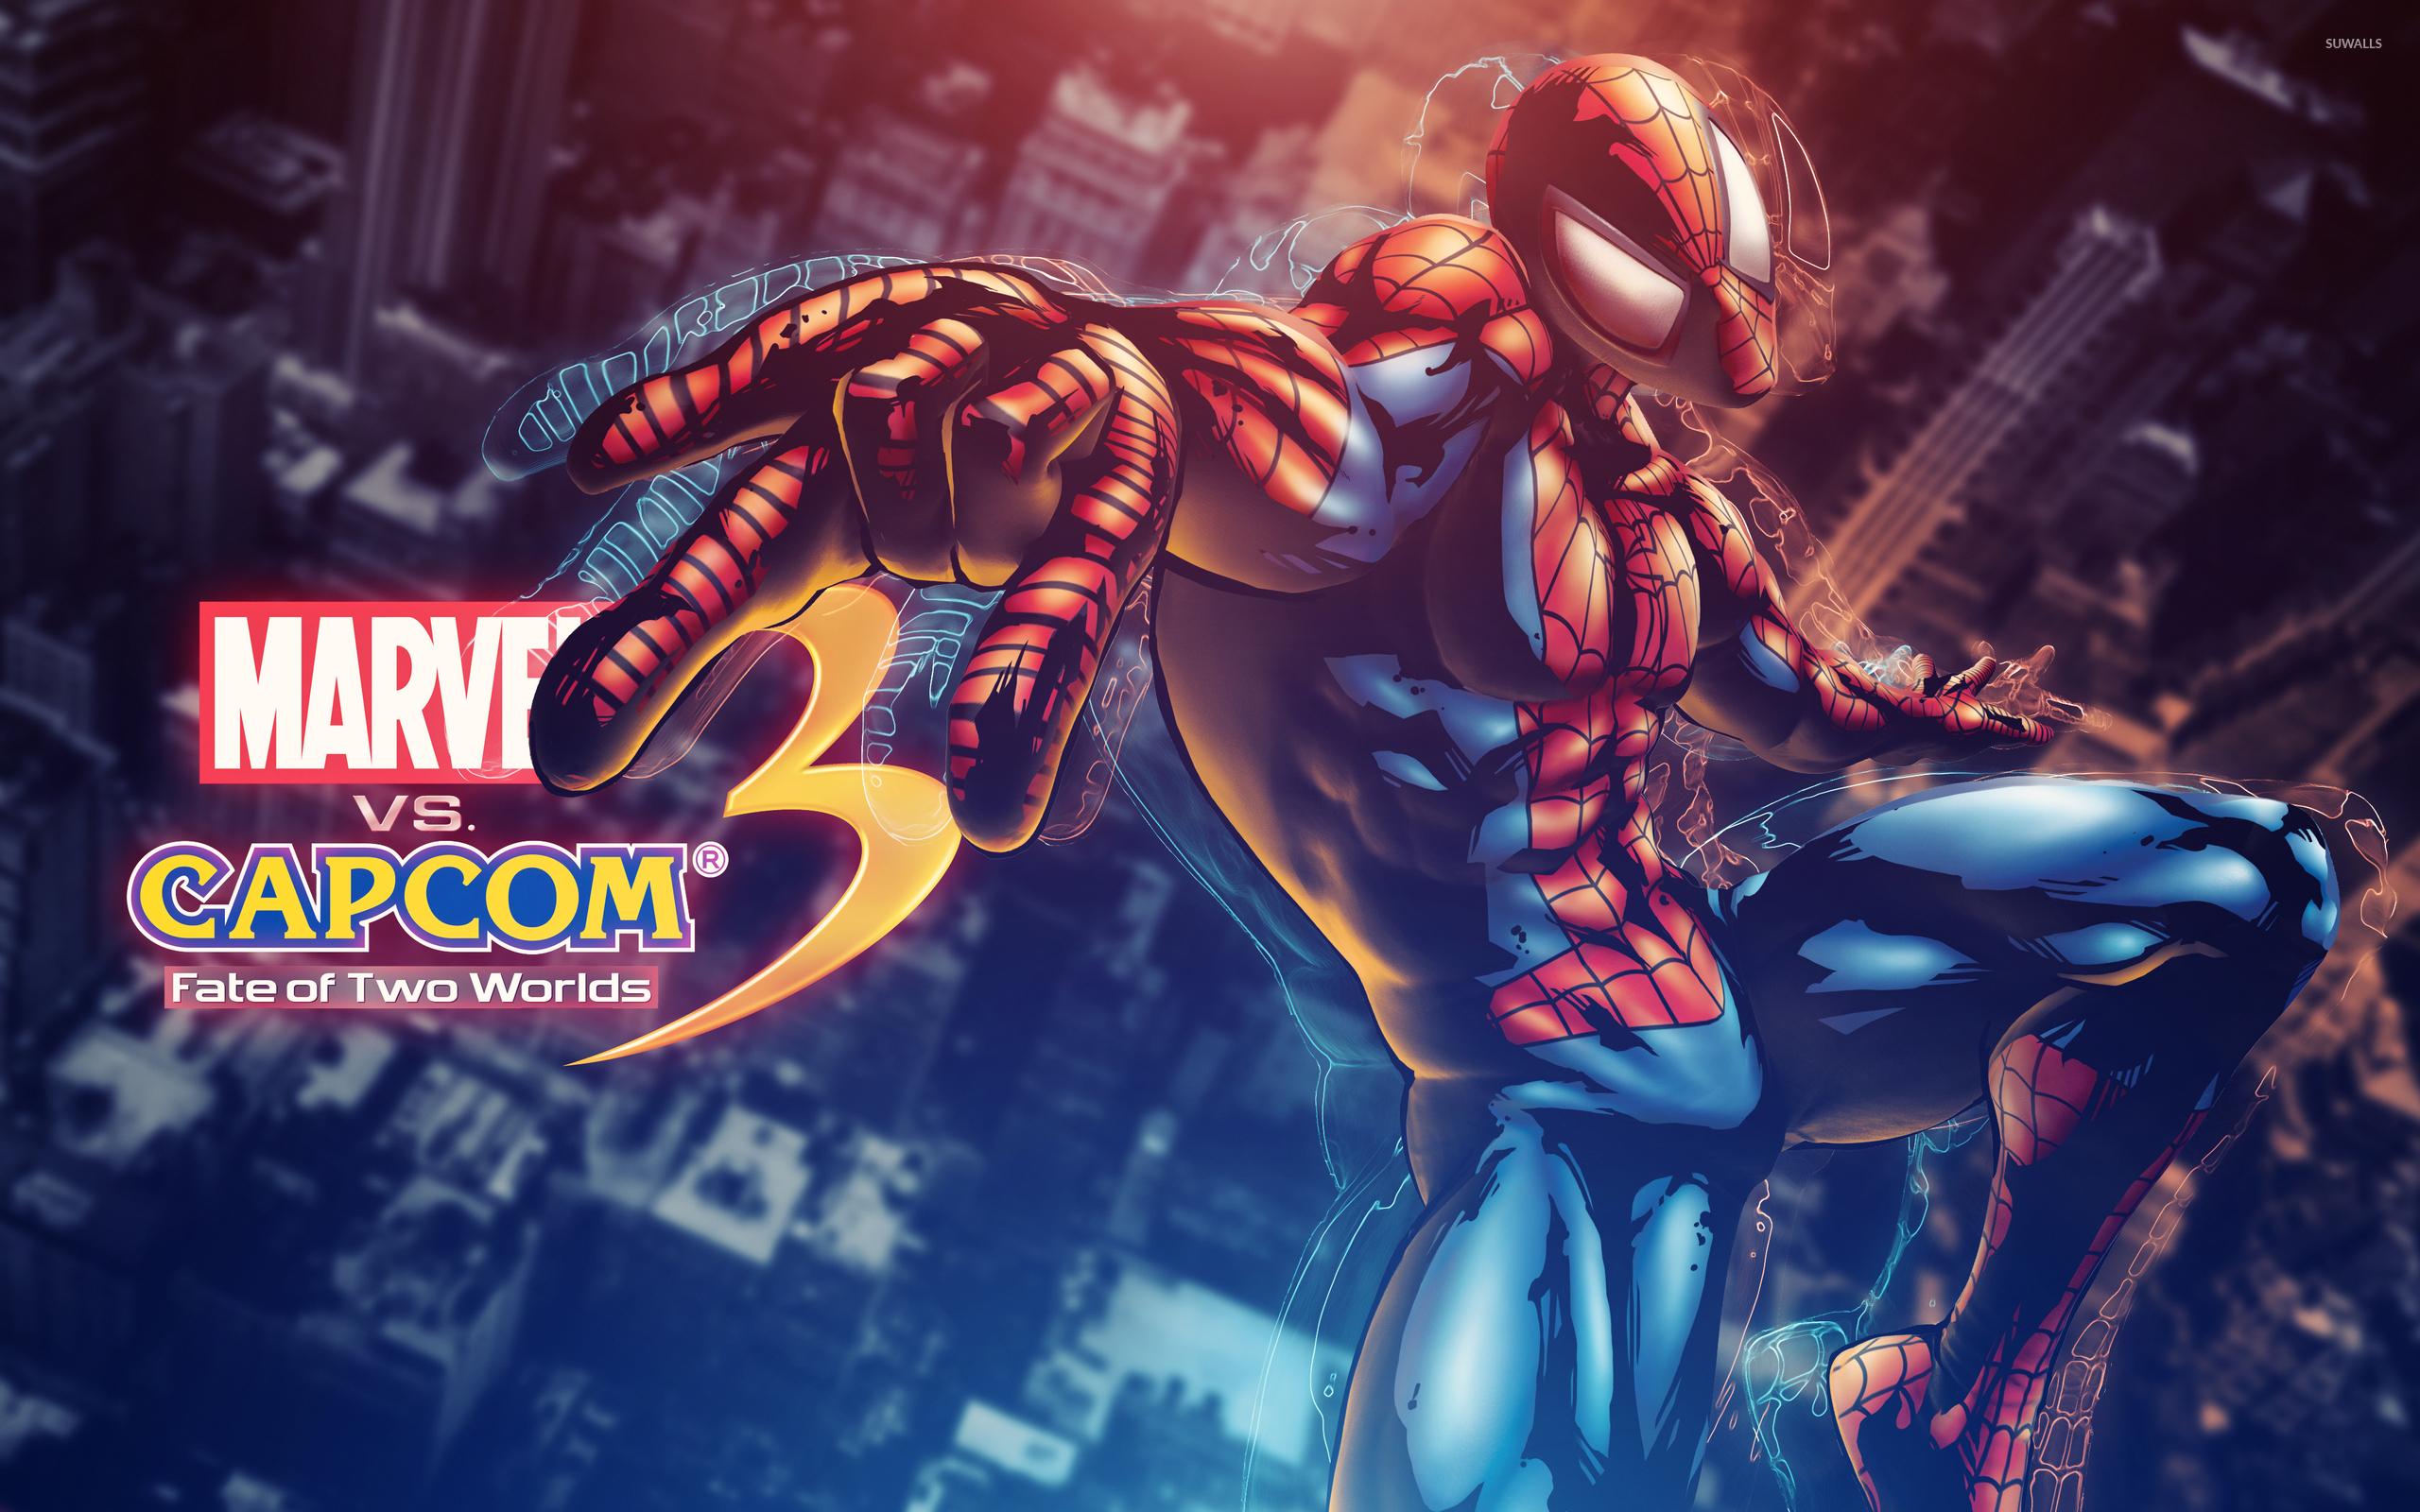 Marvel Vs Capcom Spider Man Wallpaper Game Wallpapers 2459